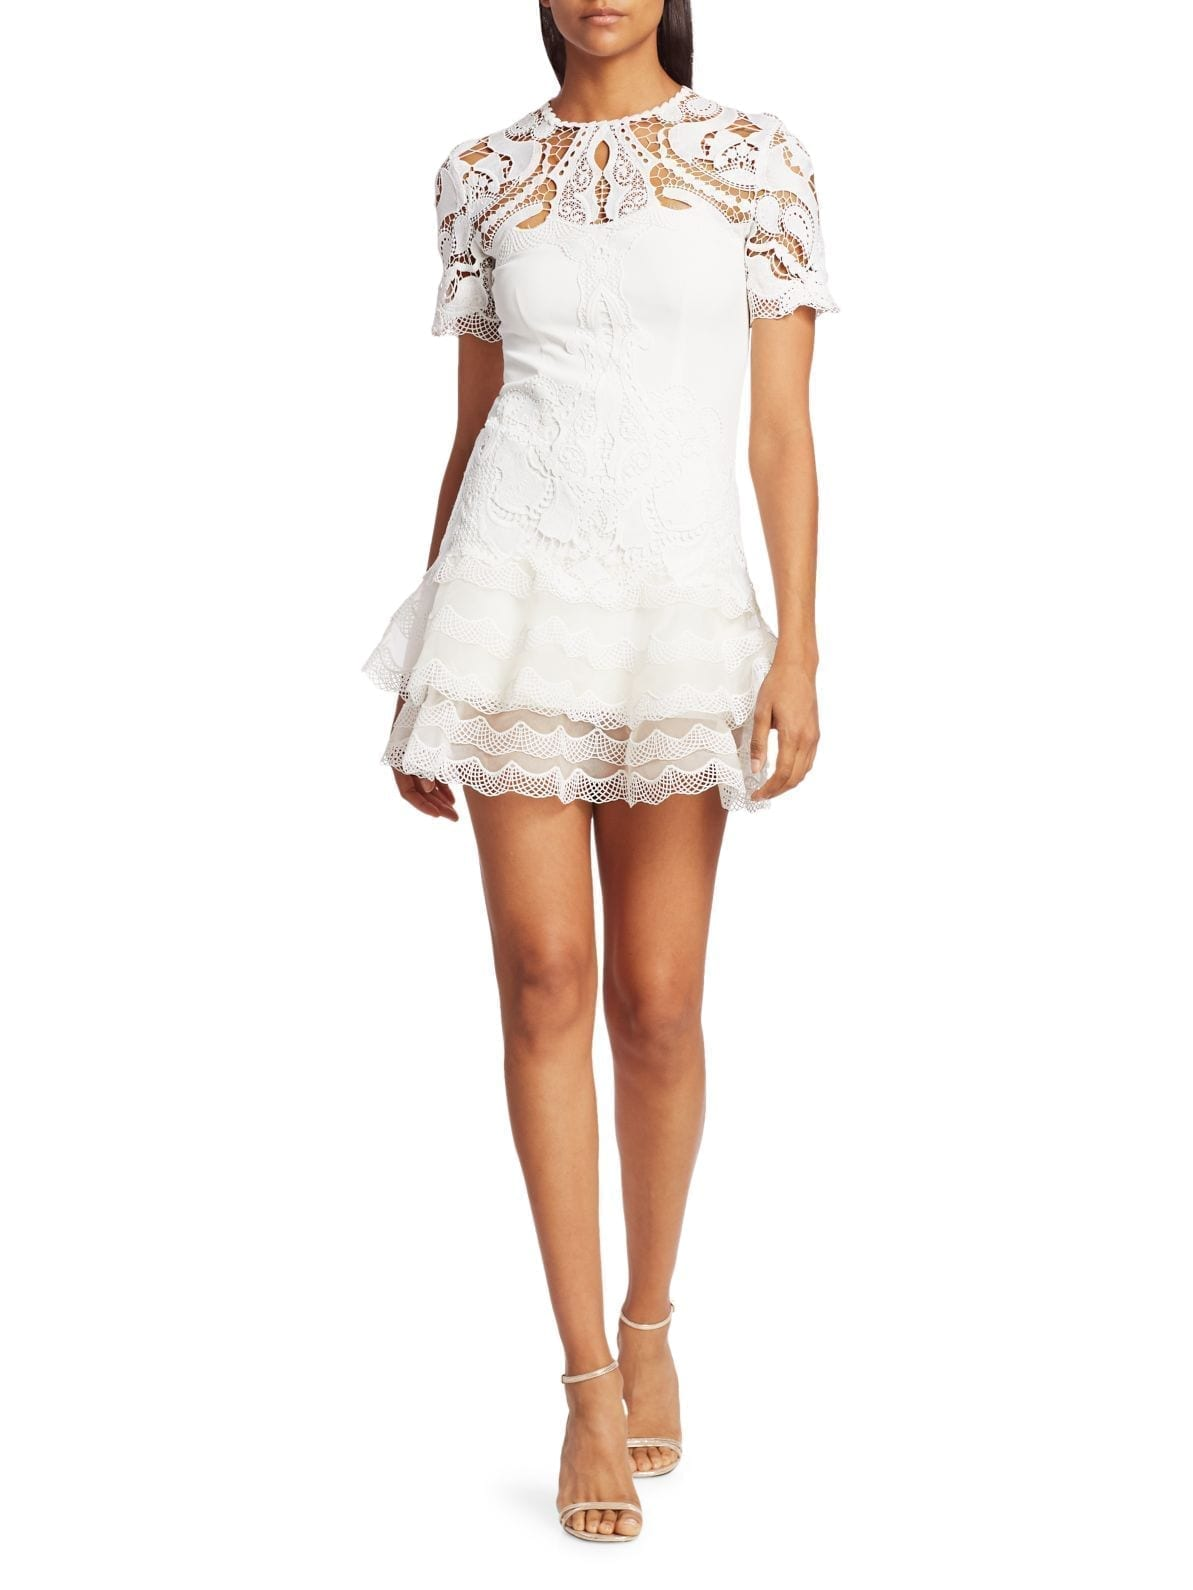 JONATHAN SIMKHAI Lace Applique Illusion Mini Dress